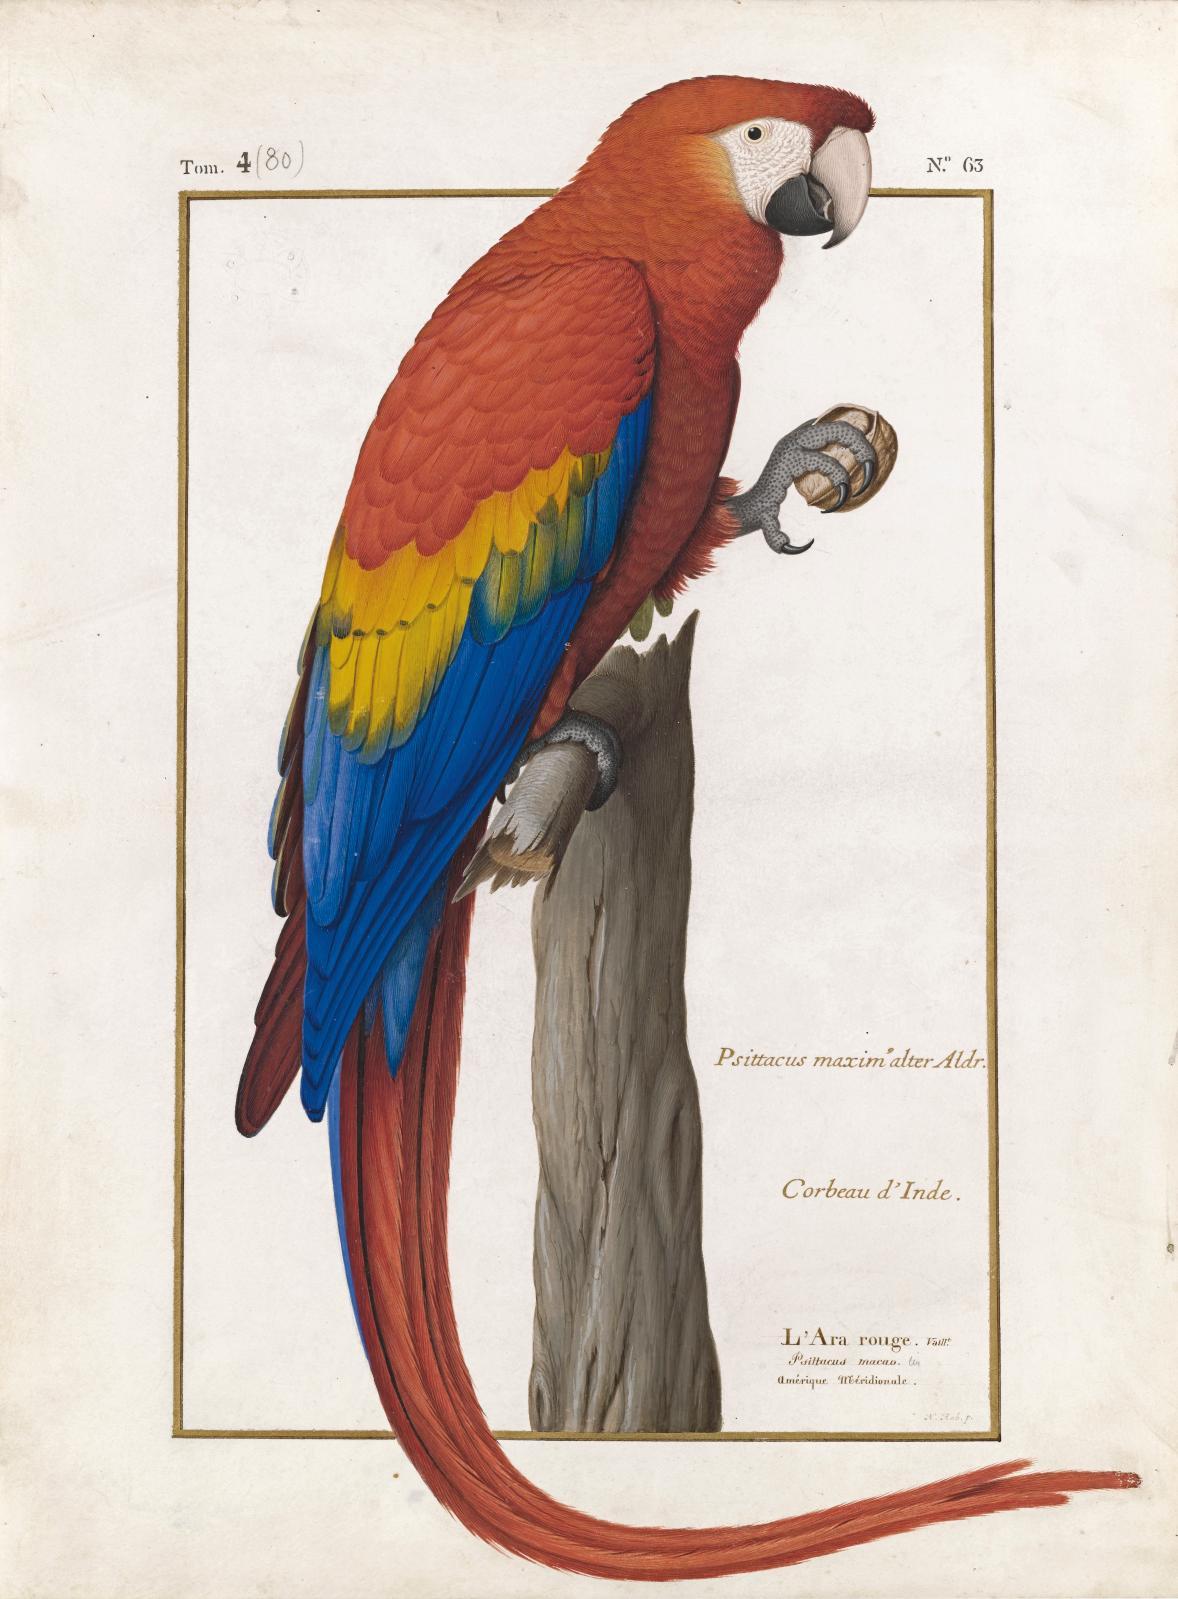 Nicolas Robert (1614-1685), L'Ara rouge (Psittacus macao), vélin du Muséum.